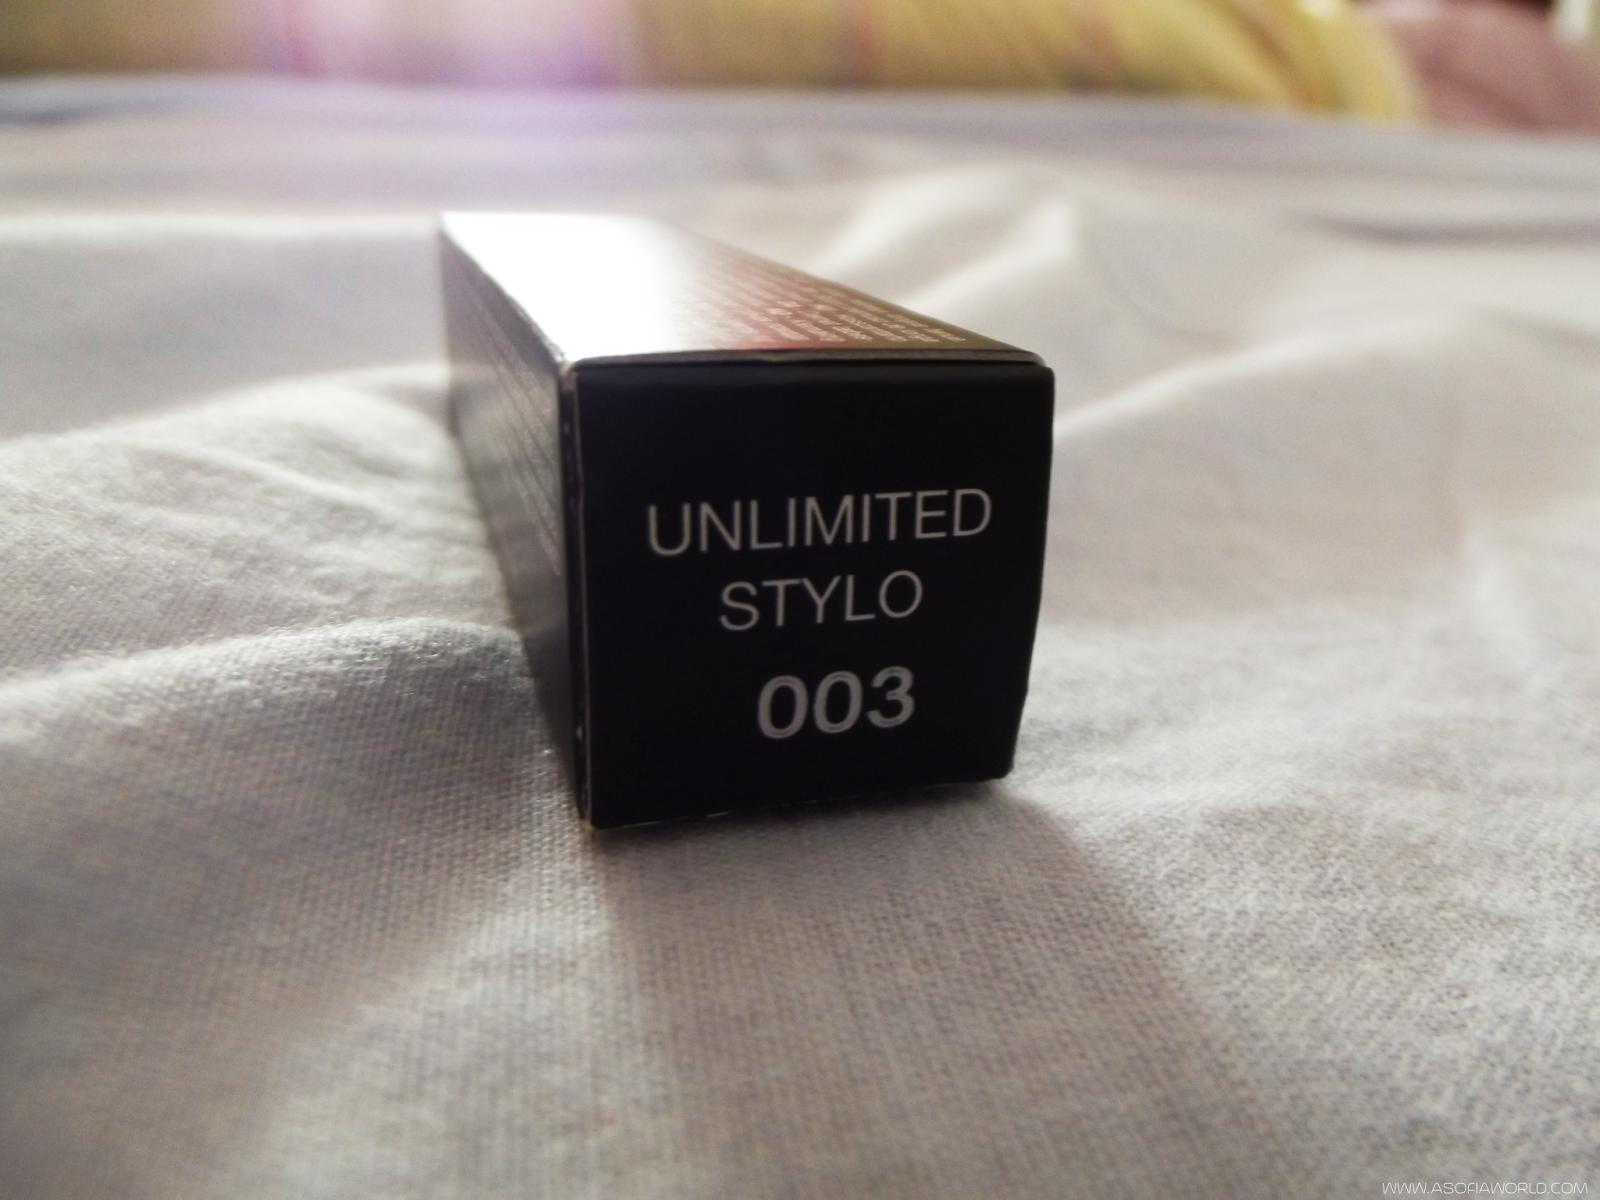 Beauty Review: Unlimited Stylo, by Kiko Cosmetics